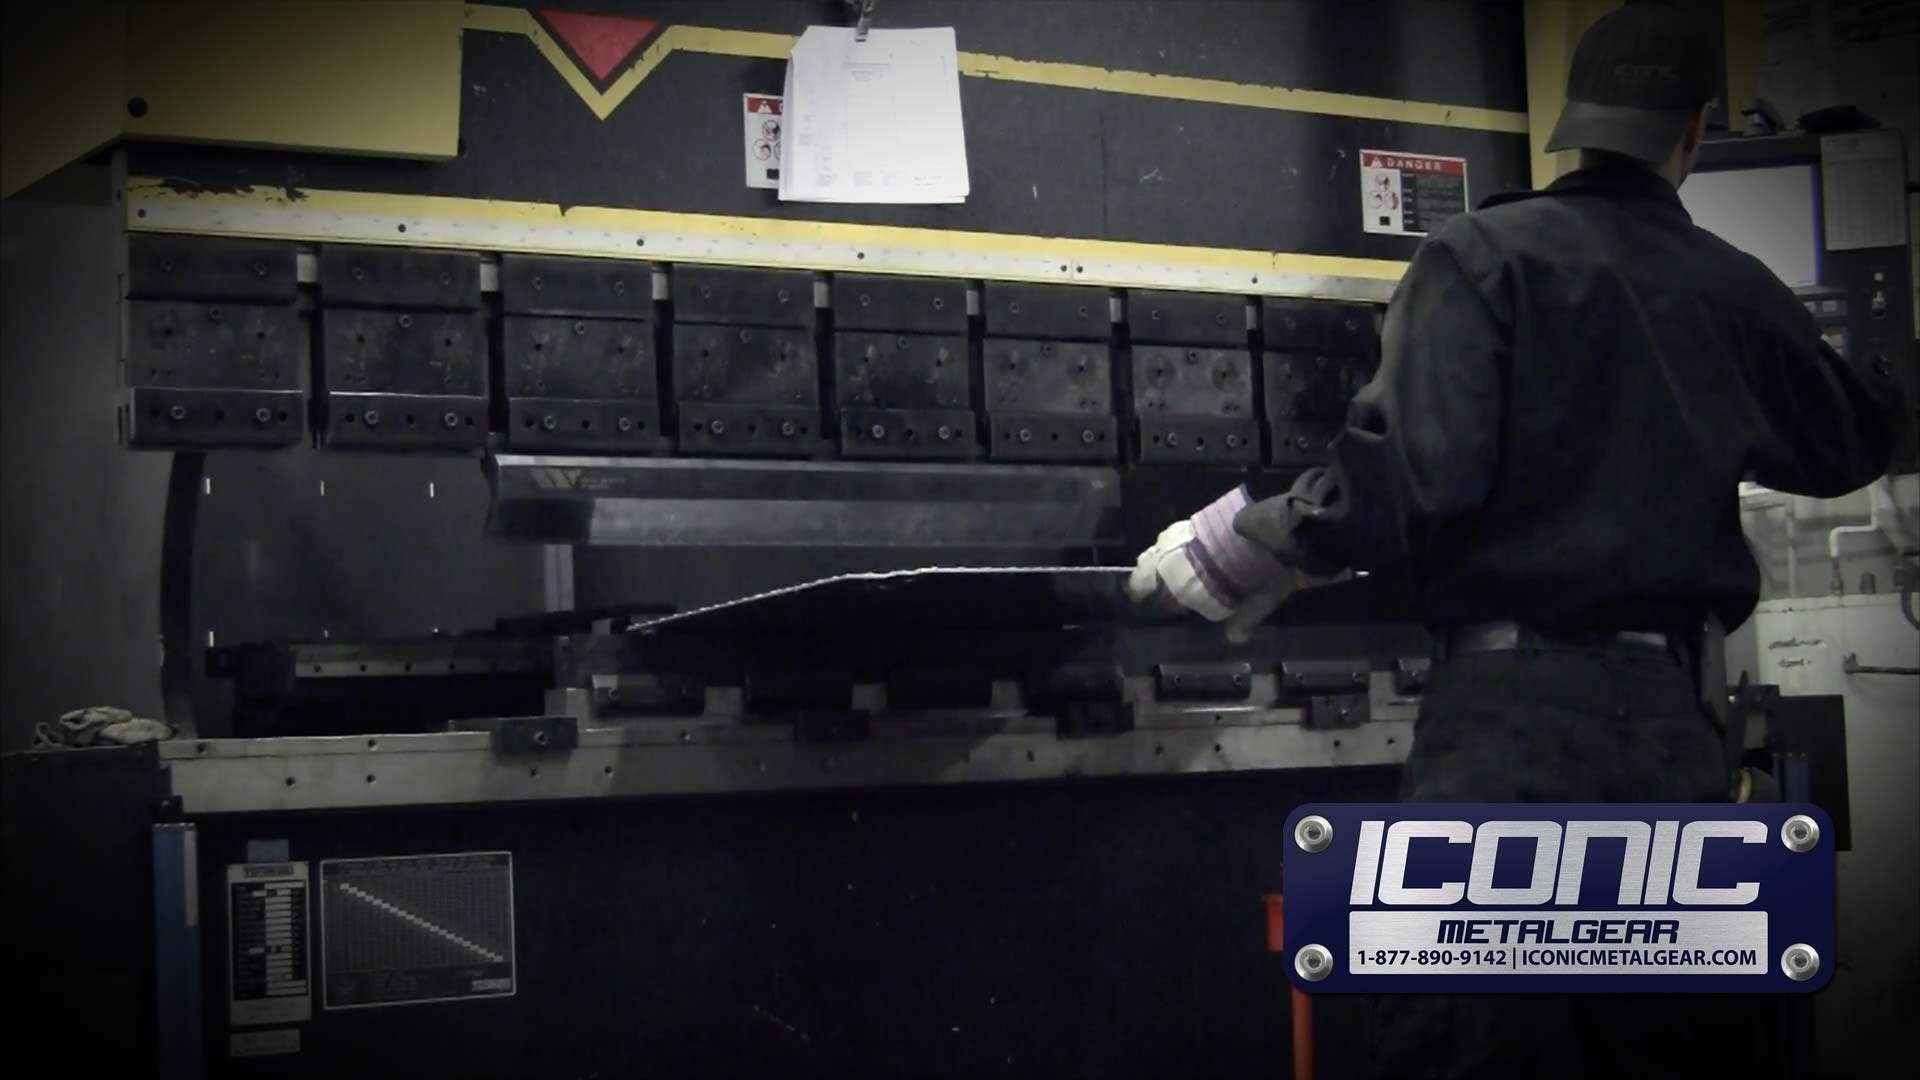 brake-press-operator-sm | Iconic MetalGear